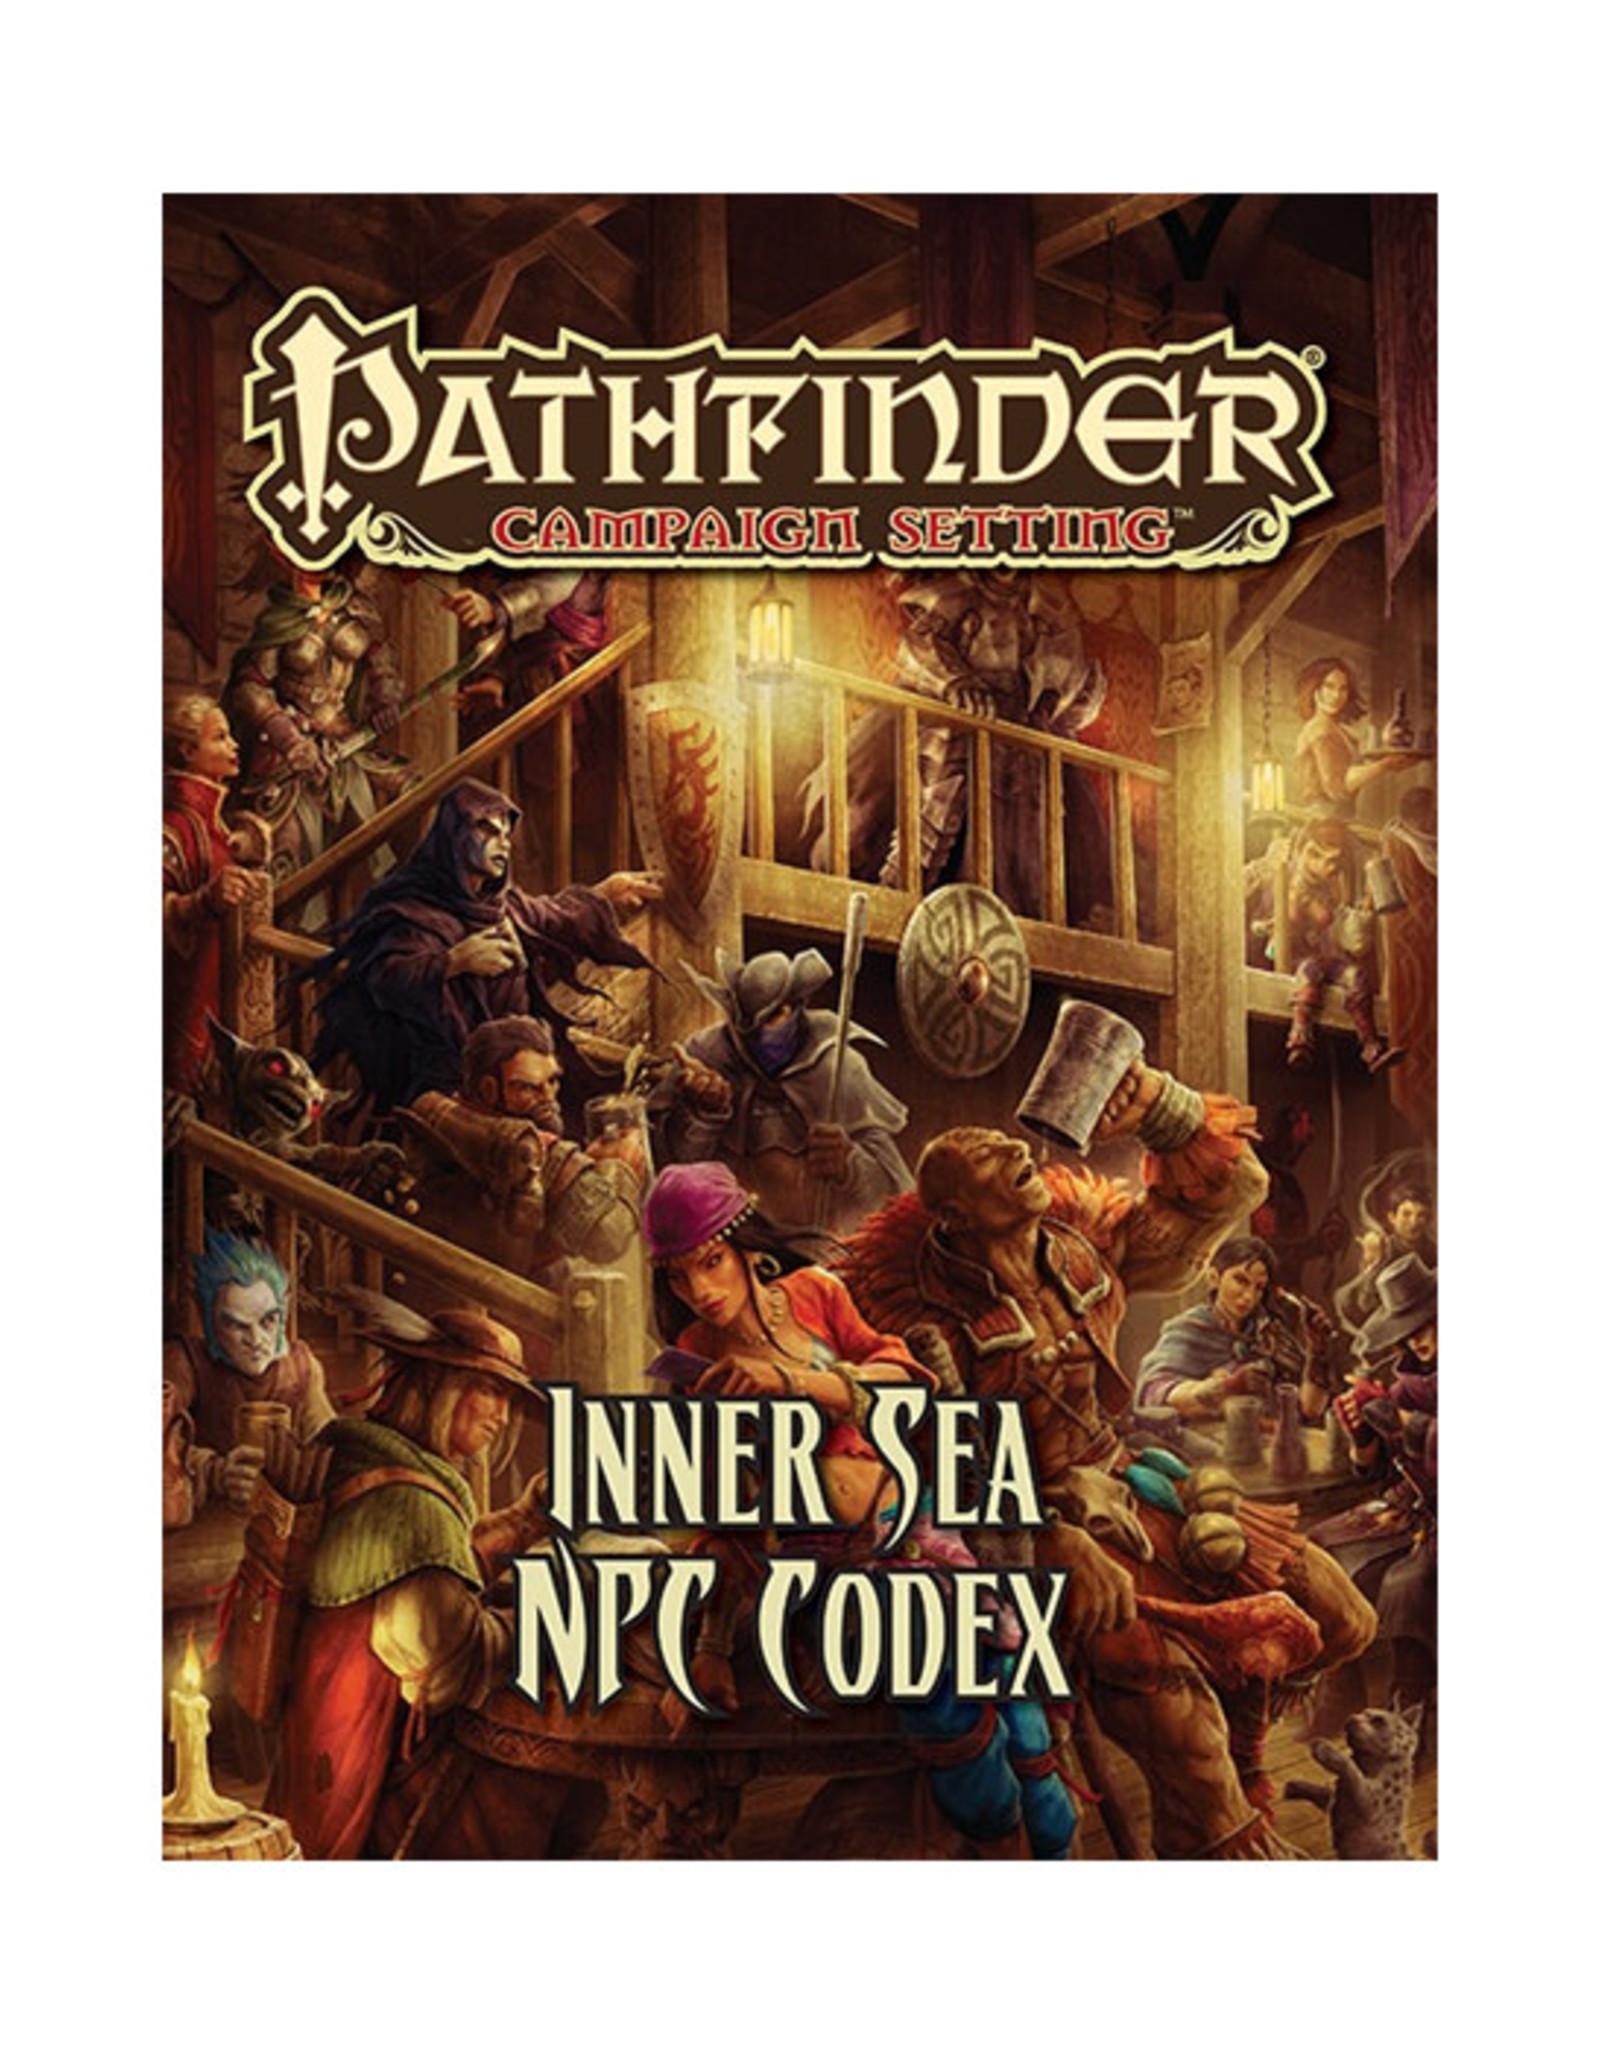 Pathfinder: Campaign Setting - Inner Sea NPC Codex